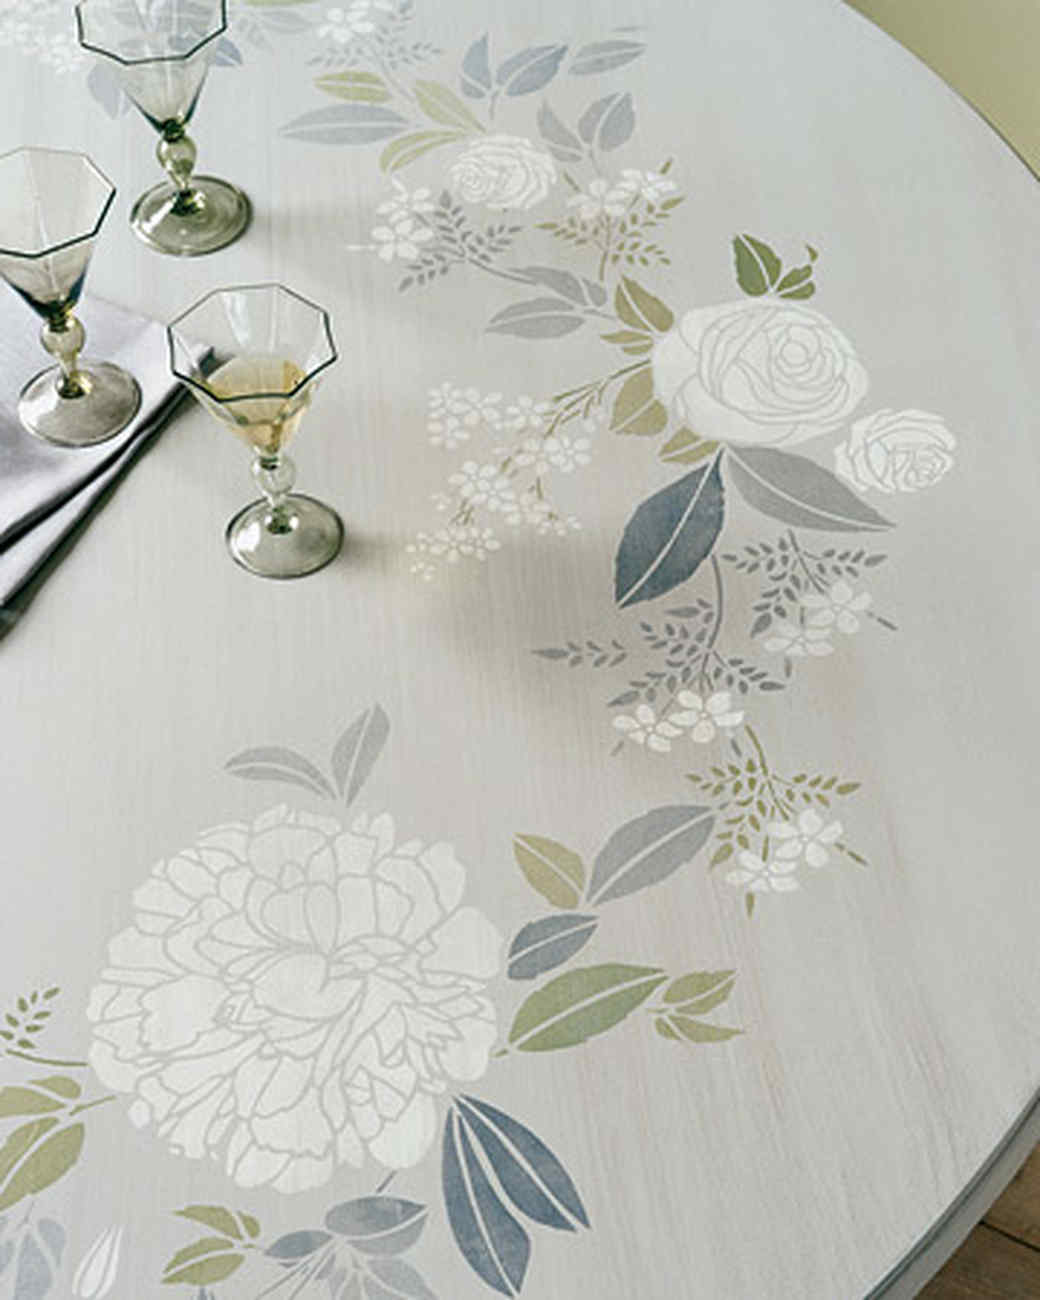 Garden Print Stenciled Tabletop